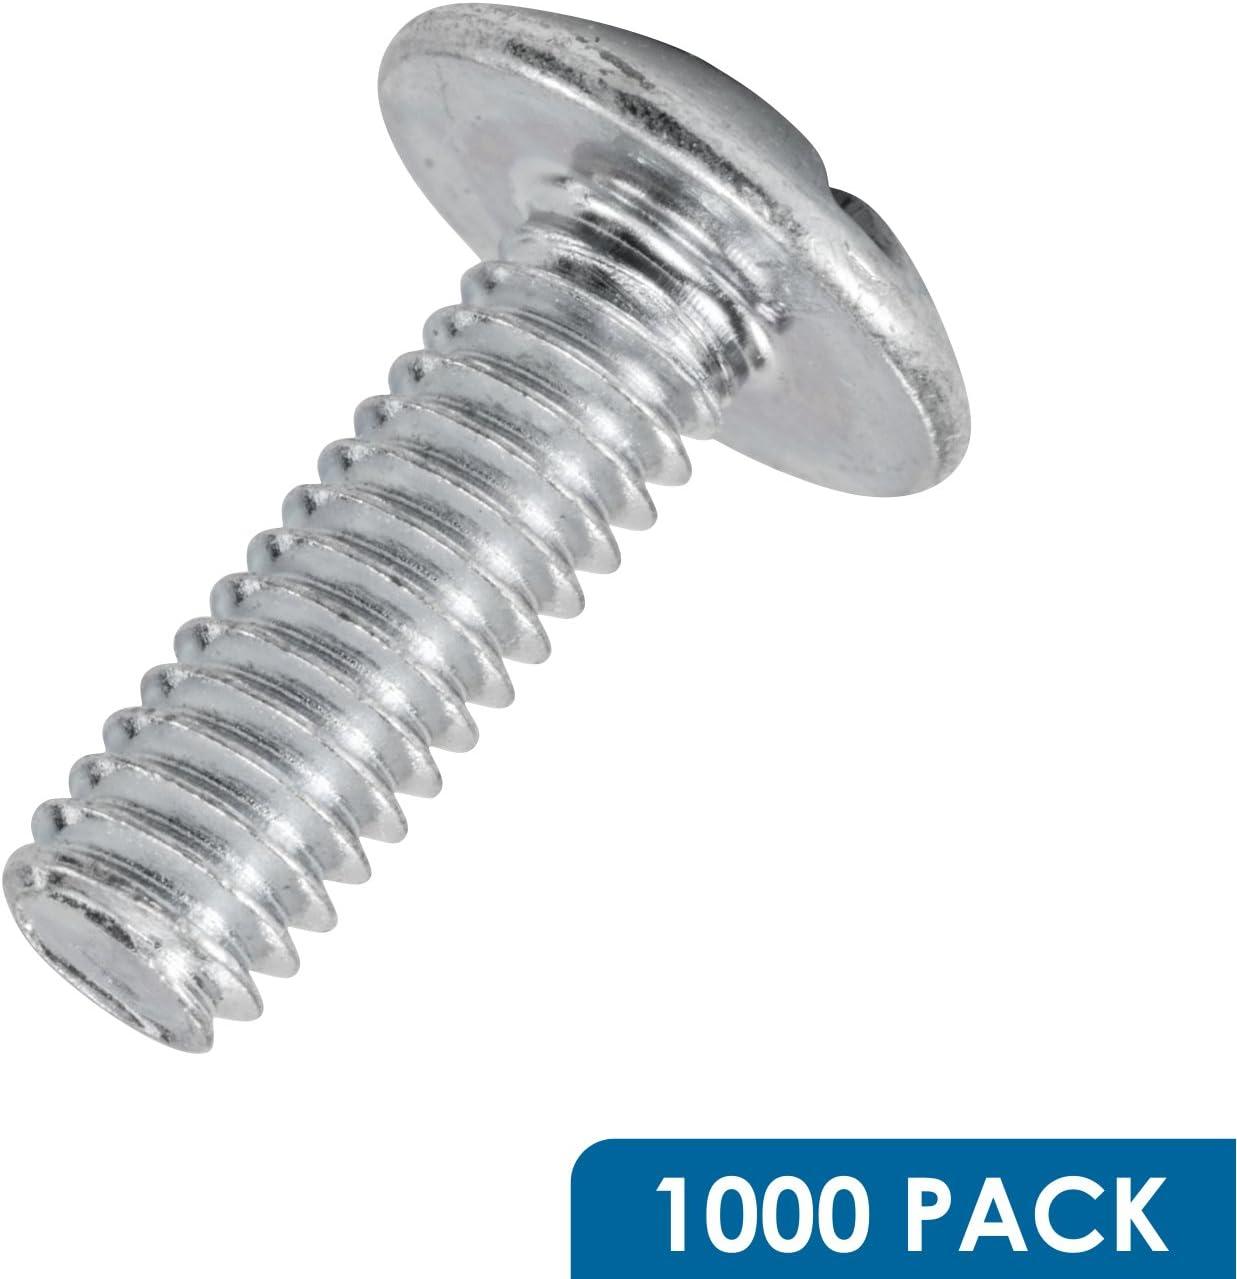 Rok Hardware 1000 Pack #8 x 1//2 Machine Thread Phillips Slotted Truss Head Knob Handle Screws Zinc